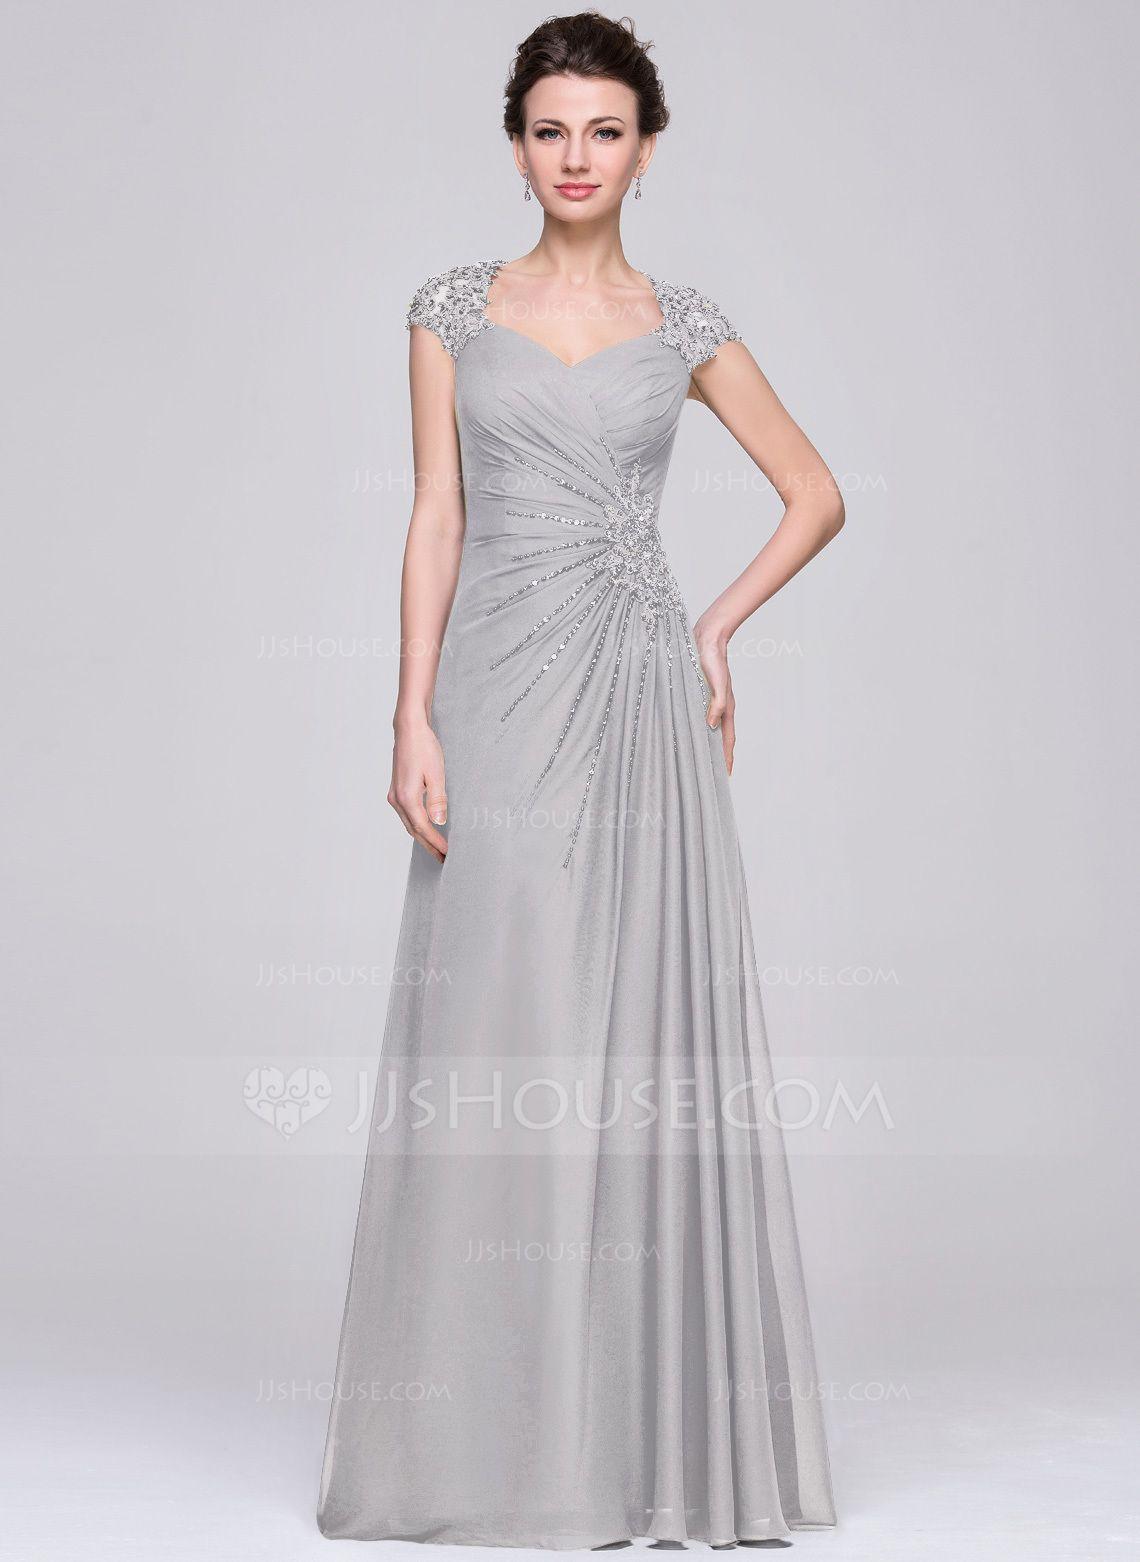 Mother dresses for a beach wedding  ALinePrincess Sweetheart FloorLength Chiffon Mother of the Bride